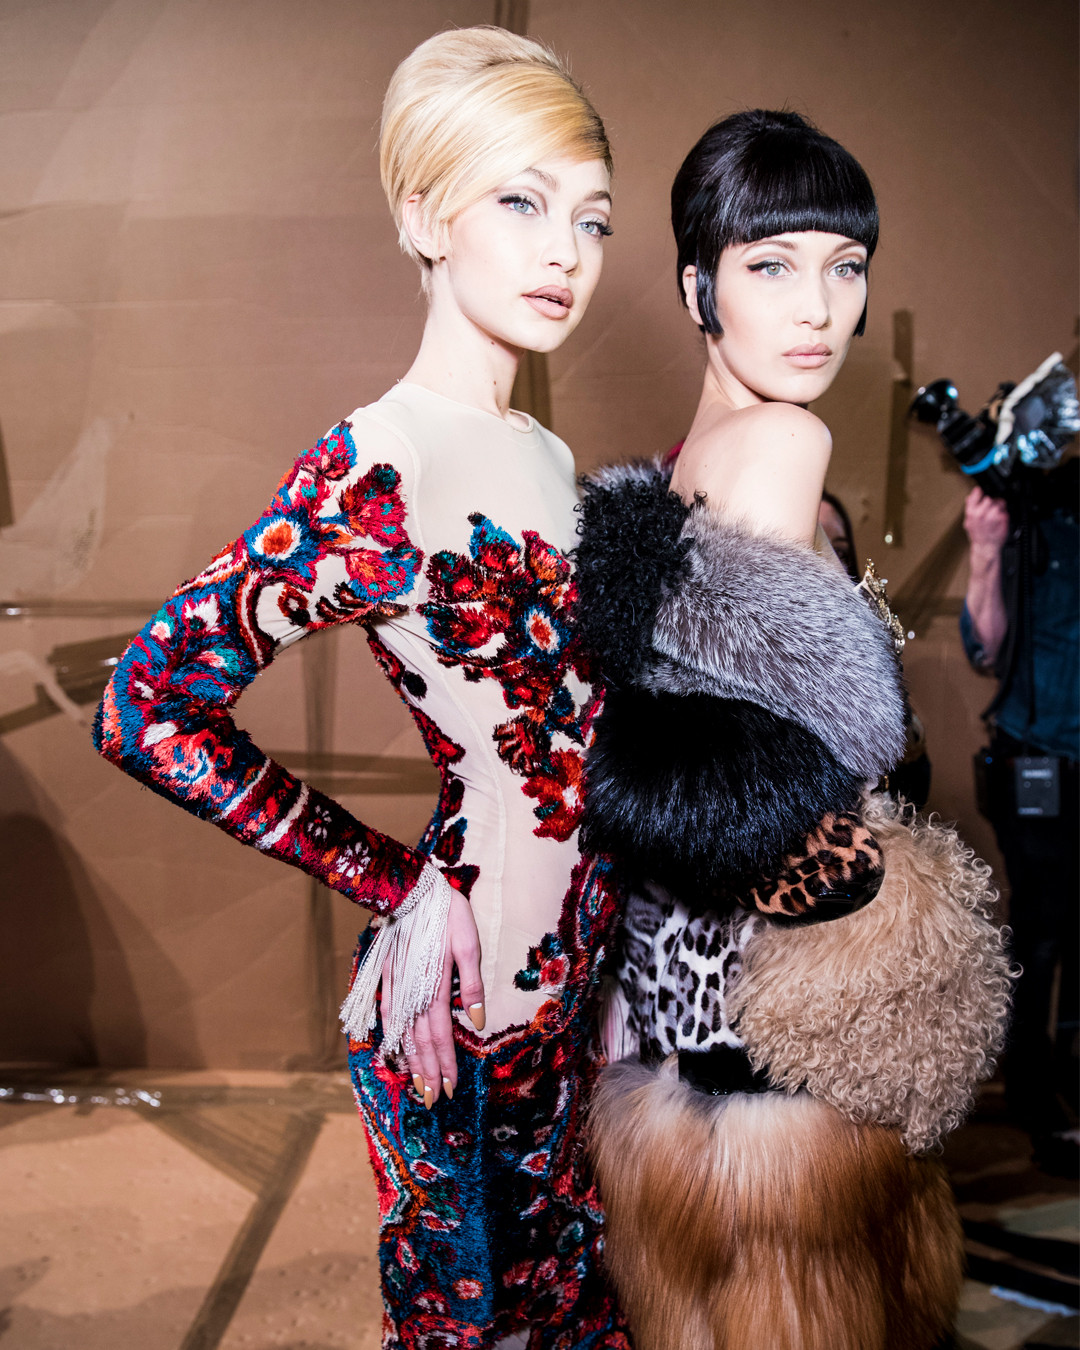 Gigi and Bella Hadid's Most Stylish Sister Moments | E! News